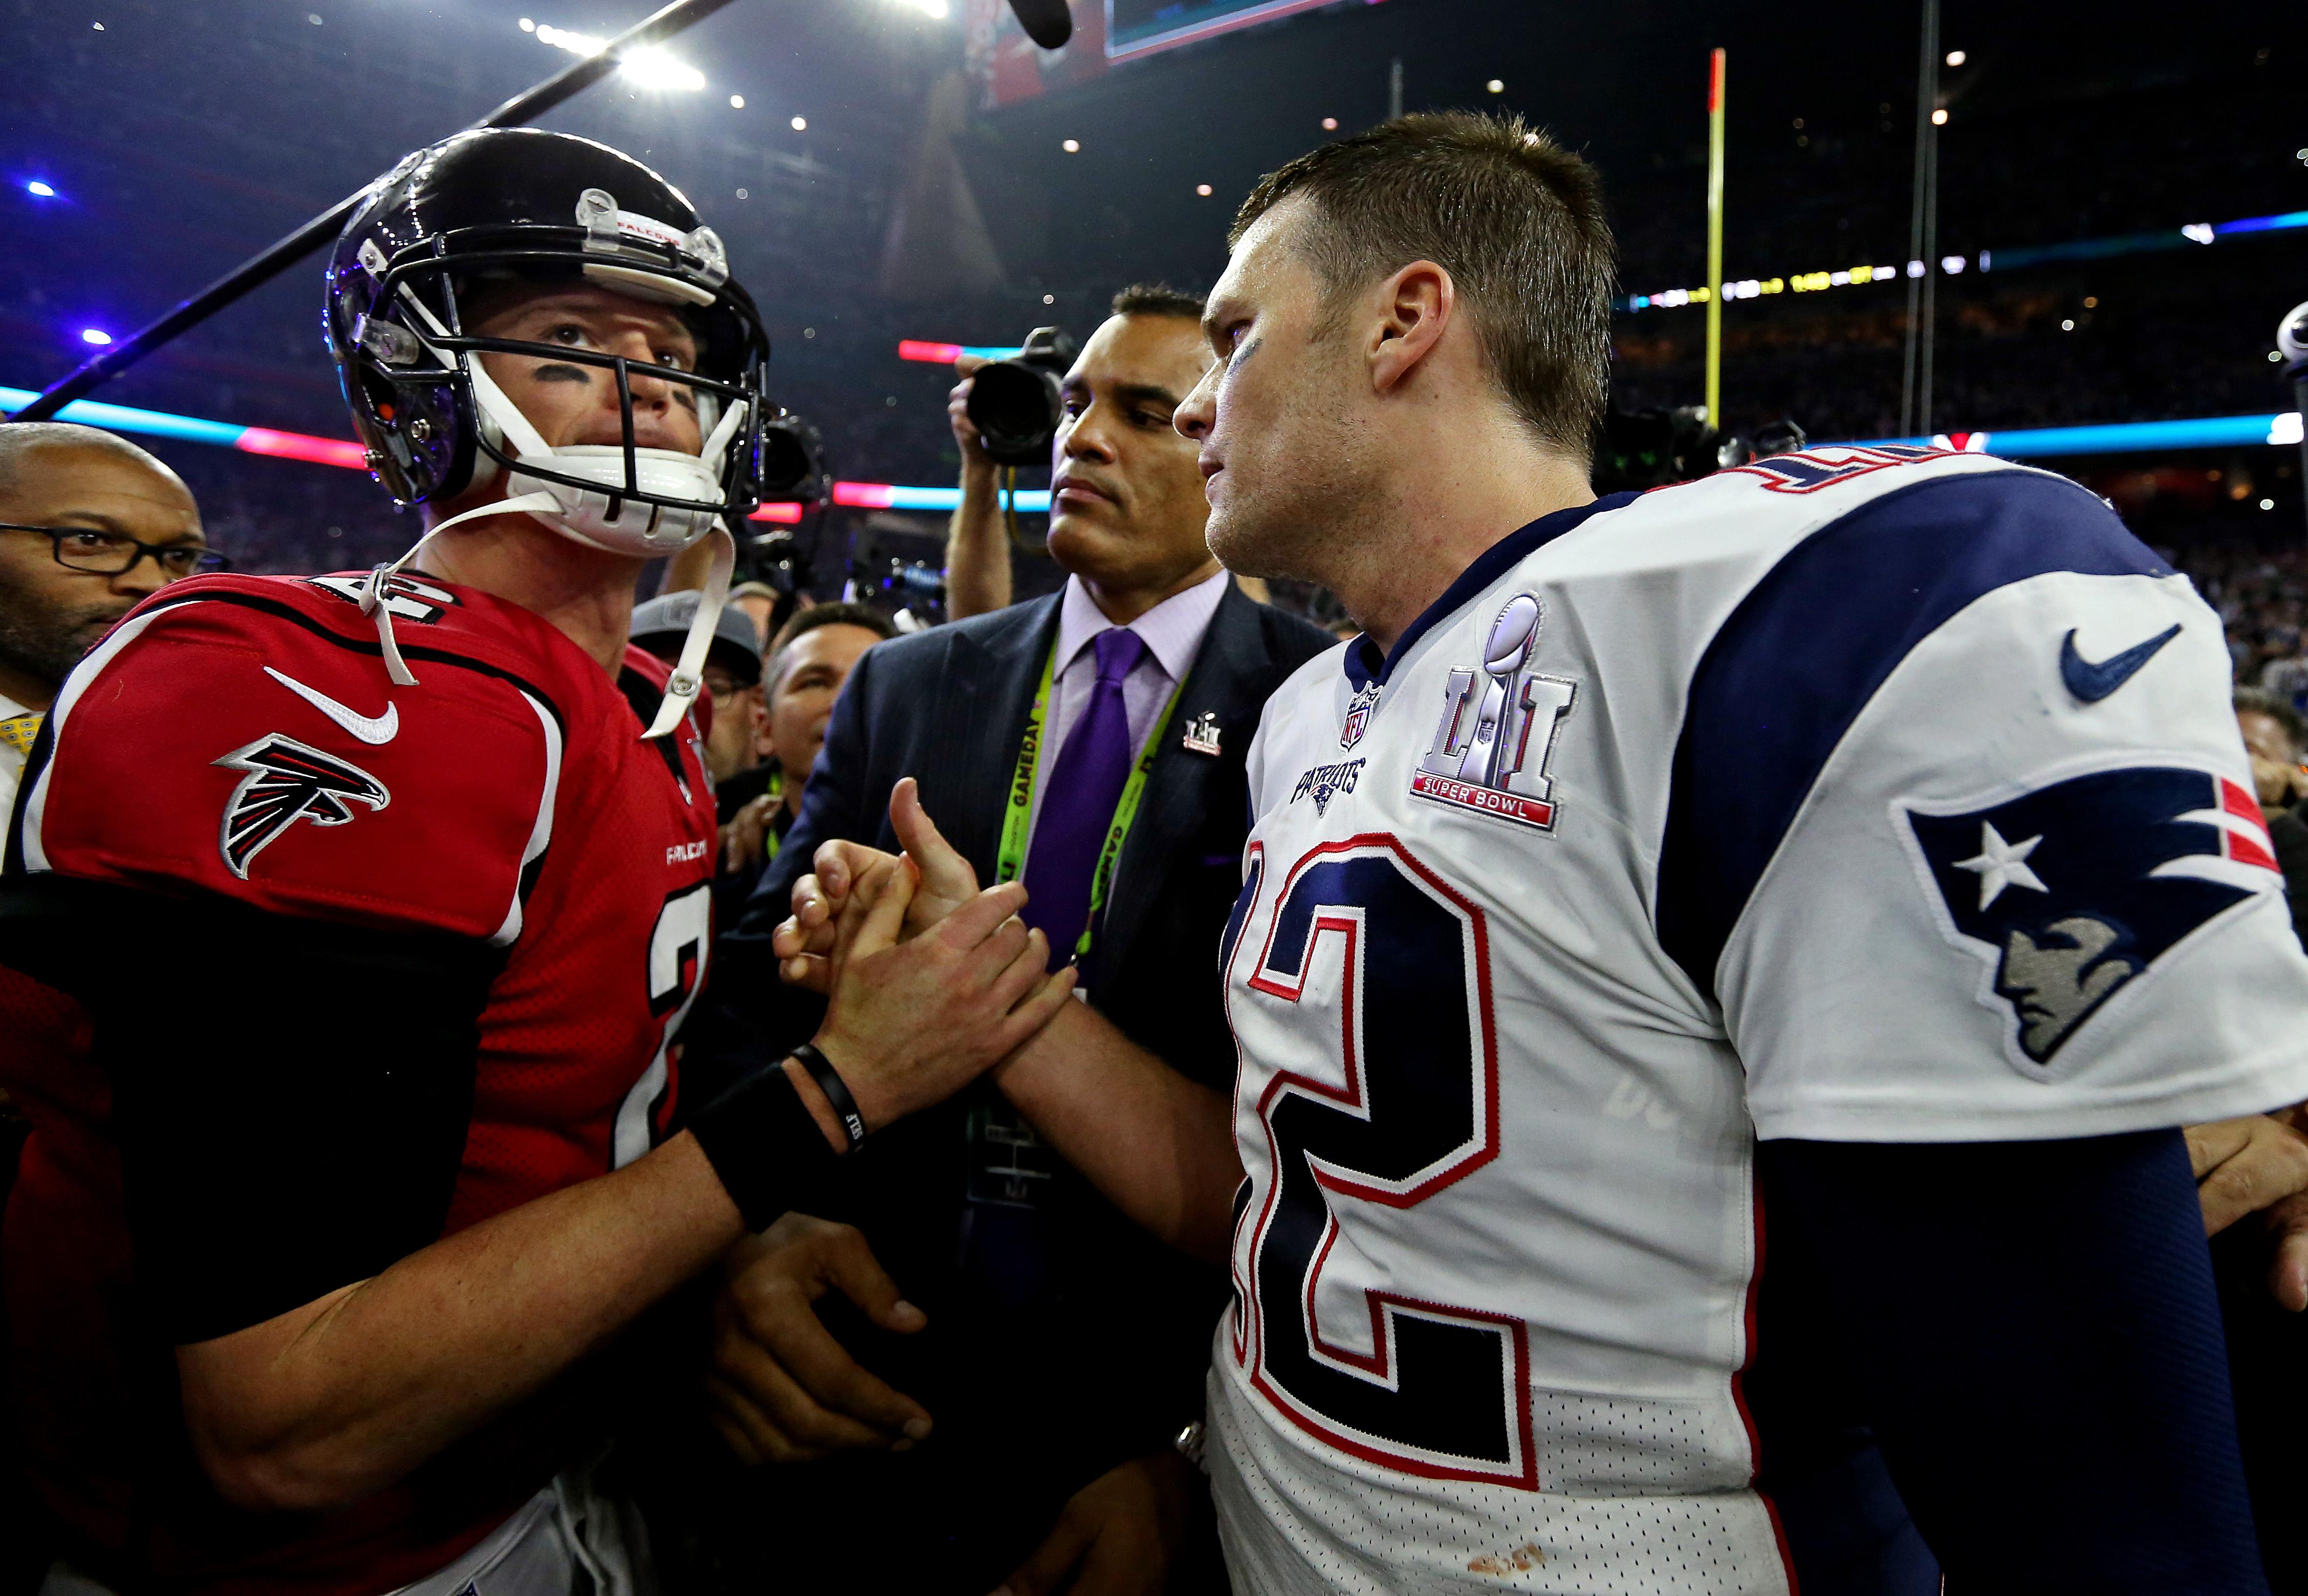 The Real Reason The Falcons Loss In The Super Bowl Hurts Worse - Atlanta falcons us fan map